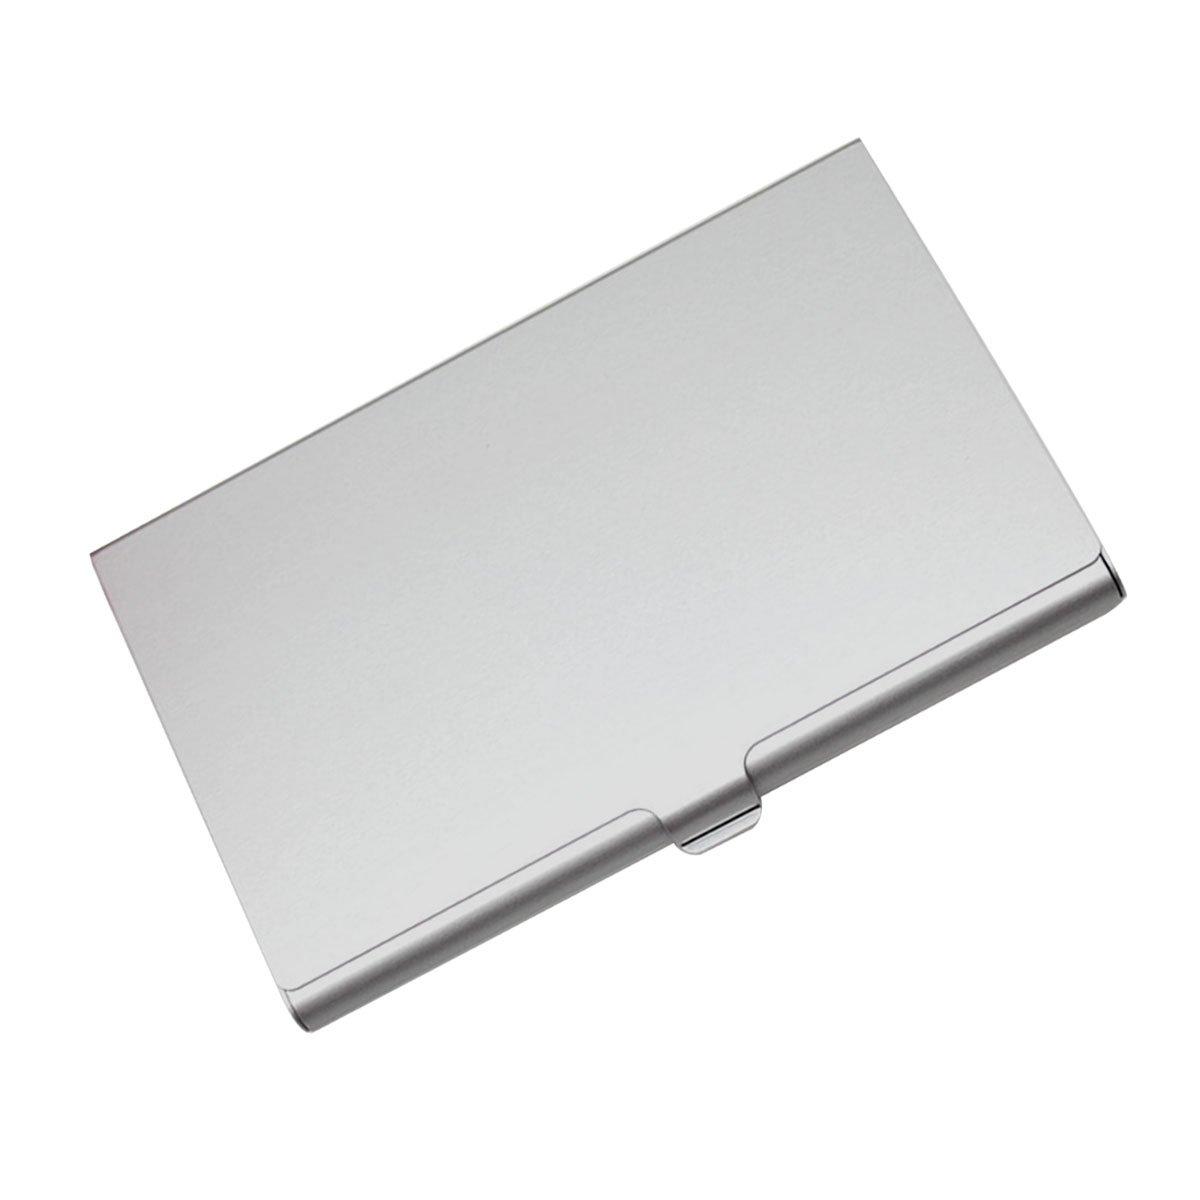 Business Card Holder Aluminum Alloy Pocket Business Card Case Credit (silver) Erms